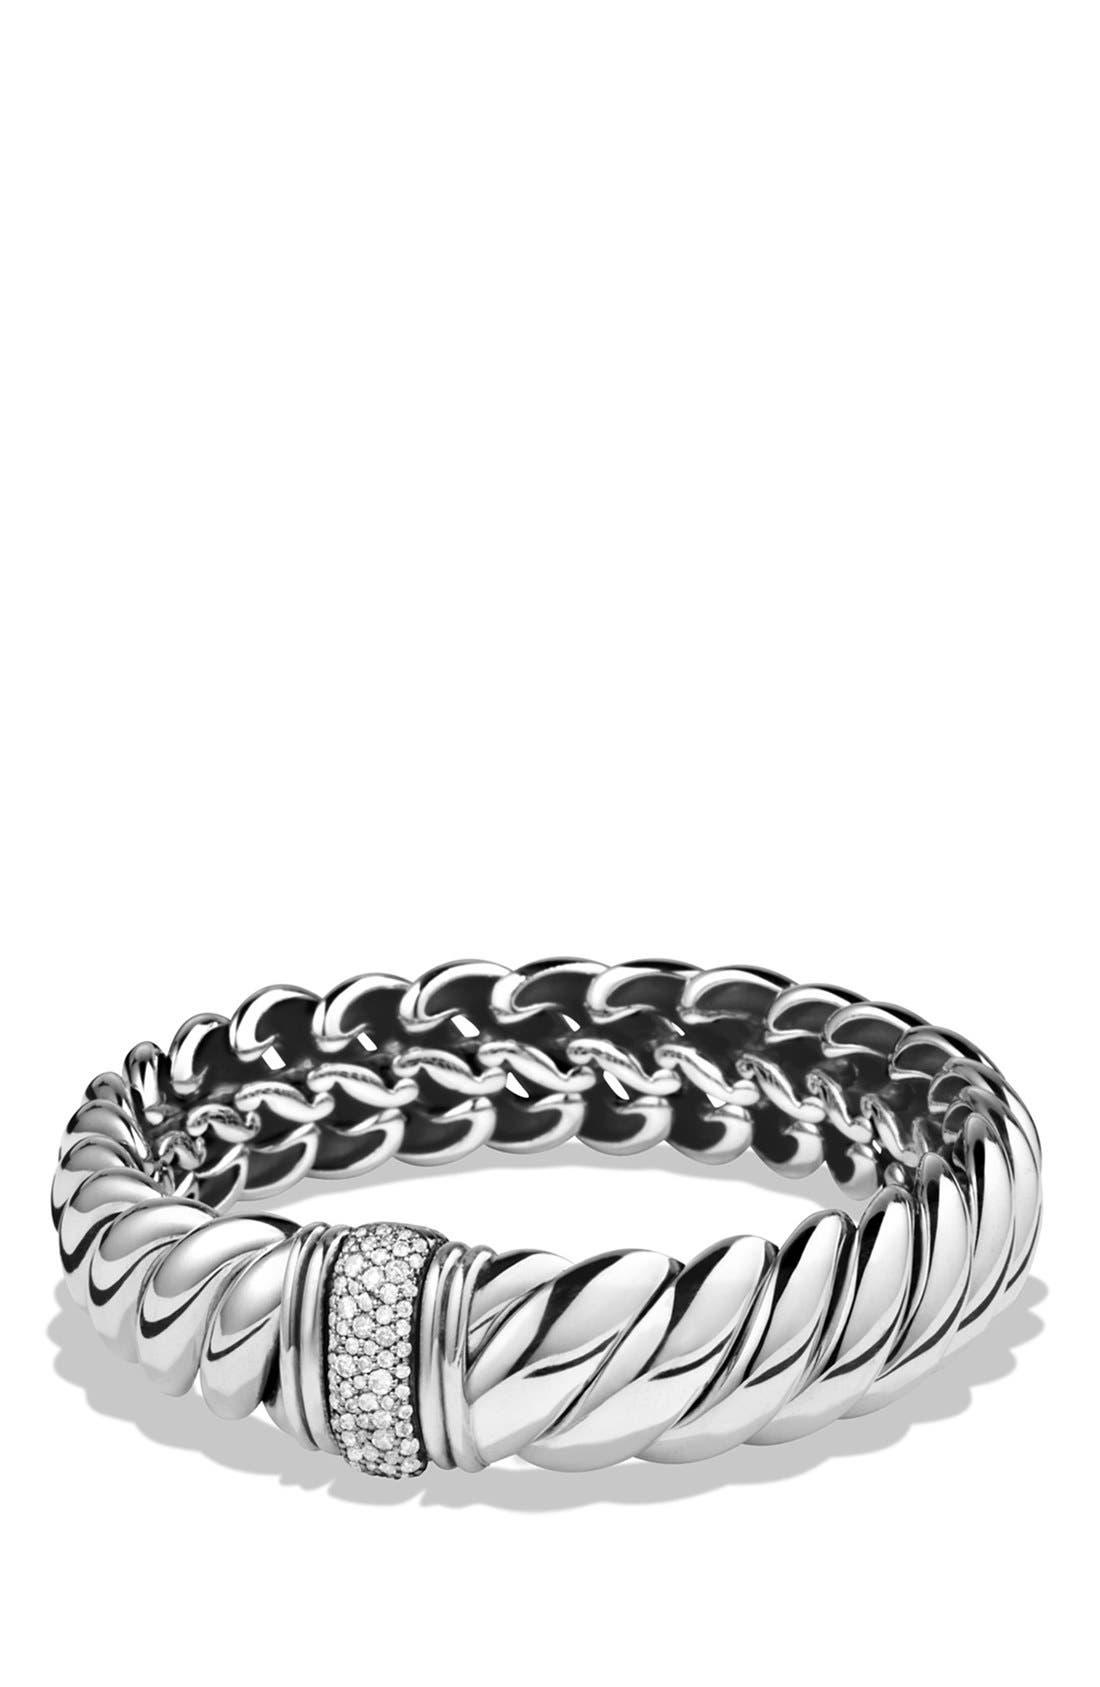 Alternate Image 2  - David Yurman 'Hampton' Bracelet with Diamonds